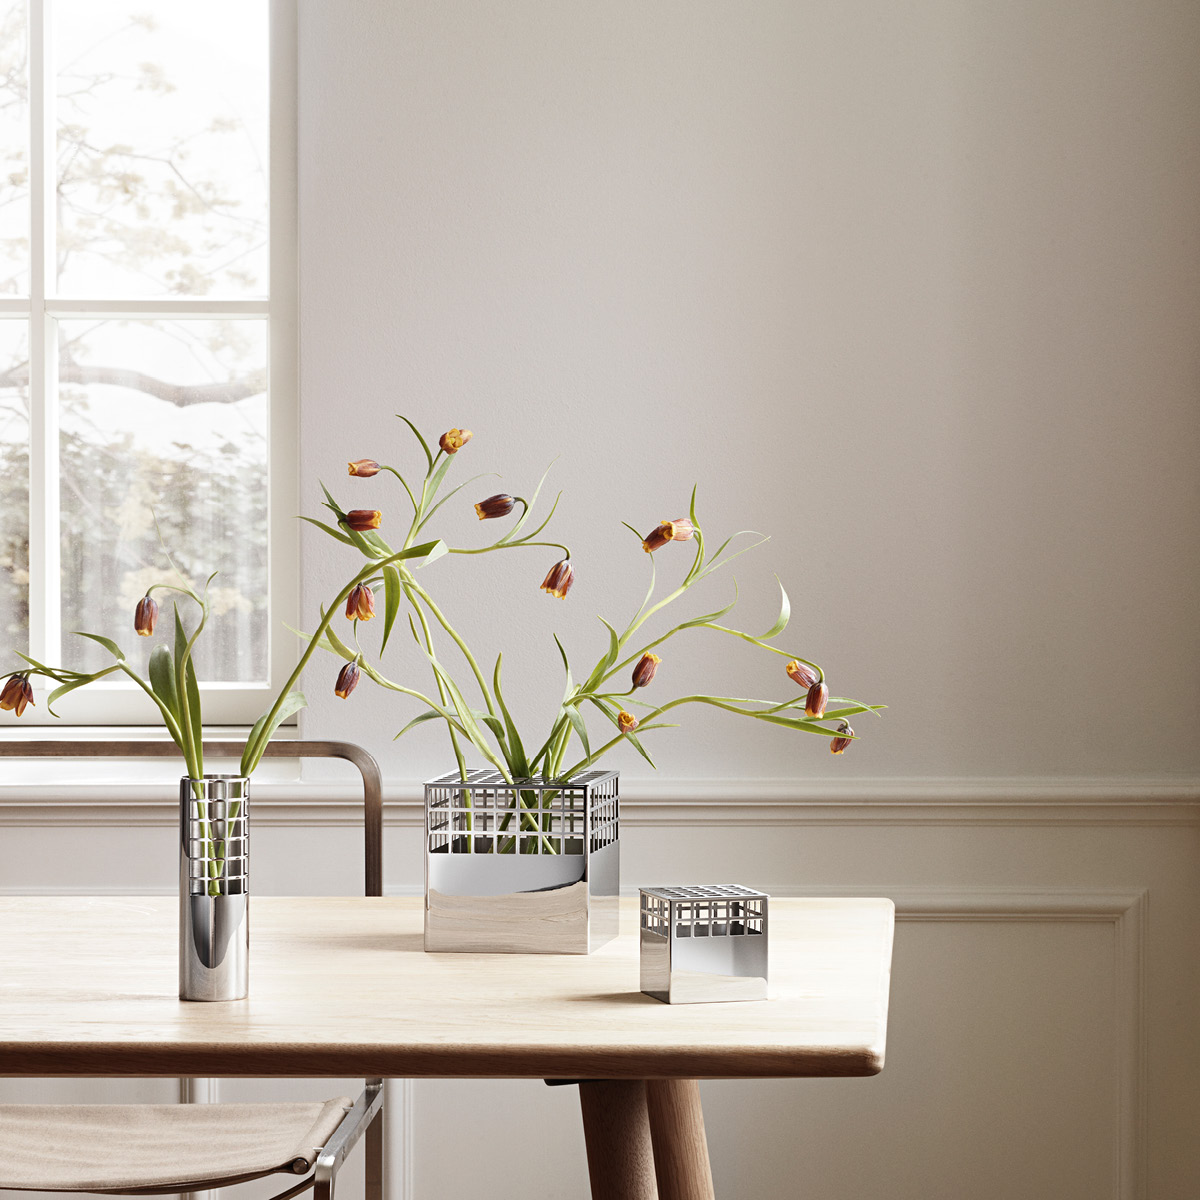 Matrix Tube Vase medium, Cube Vases medium and small in mirror polished stainless steel